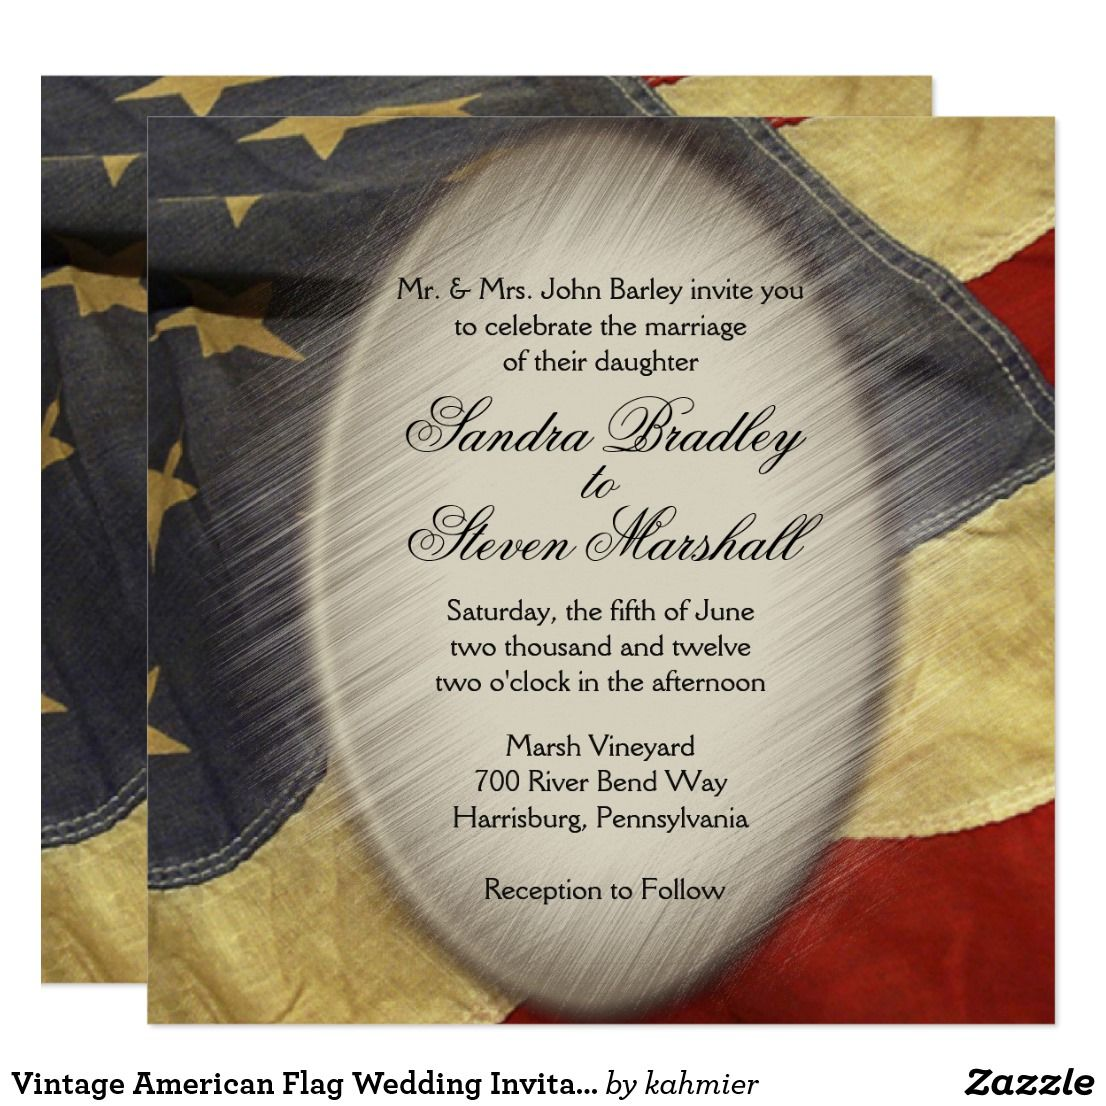 Vintage American Flag Wedding Invitations | ~Zazzle Wedding ...